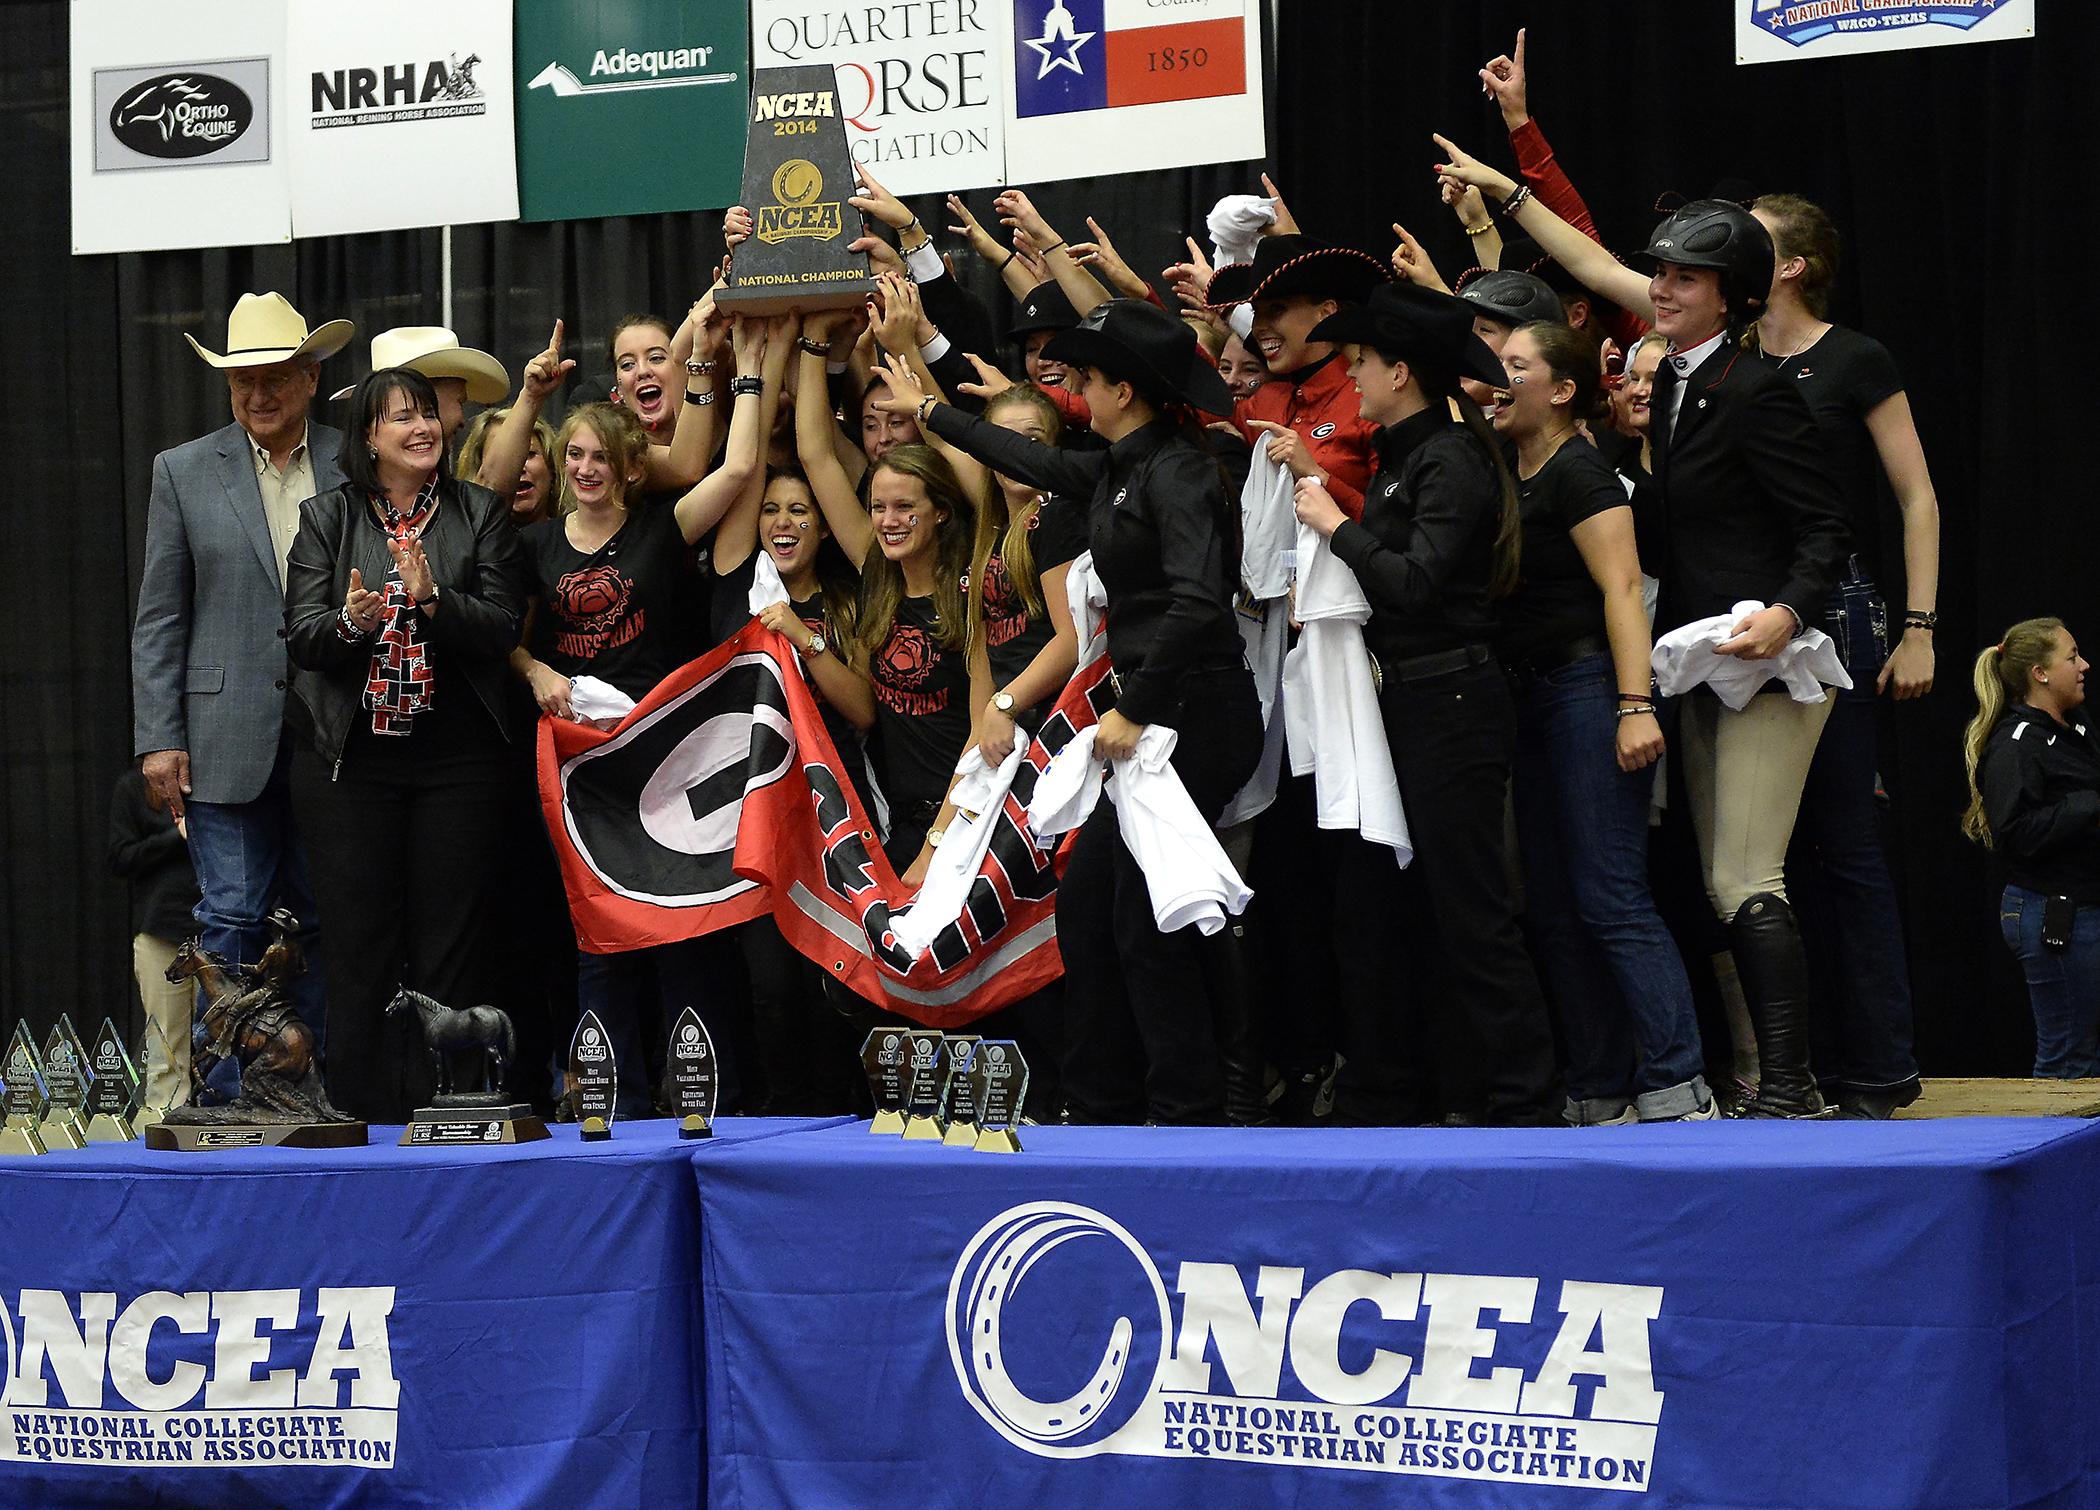 ncea national championship 2020